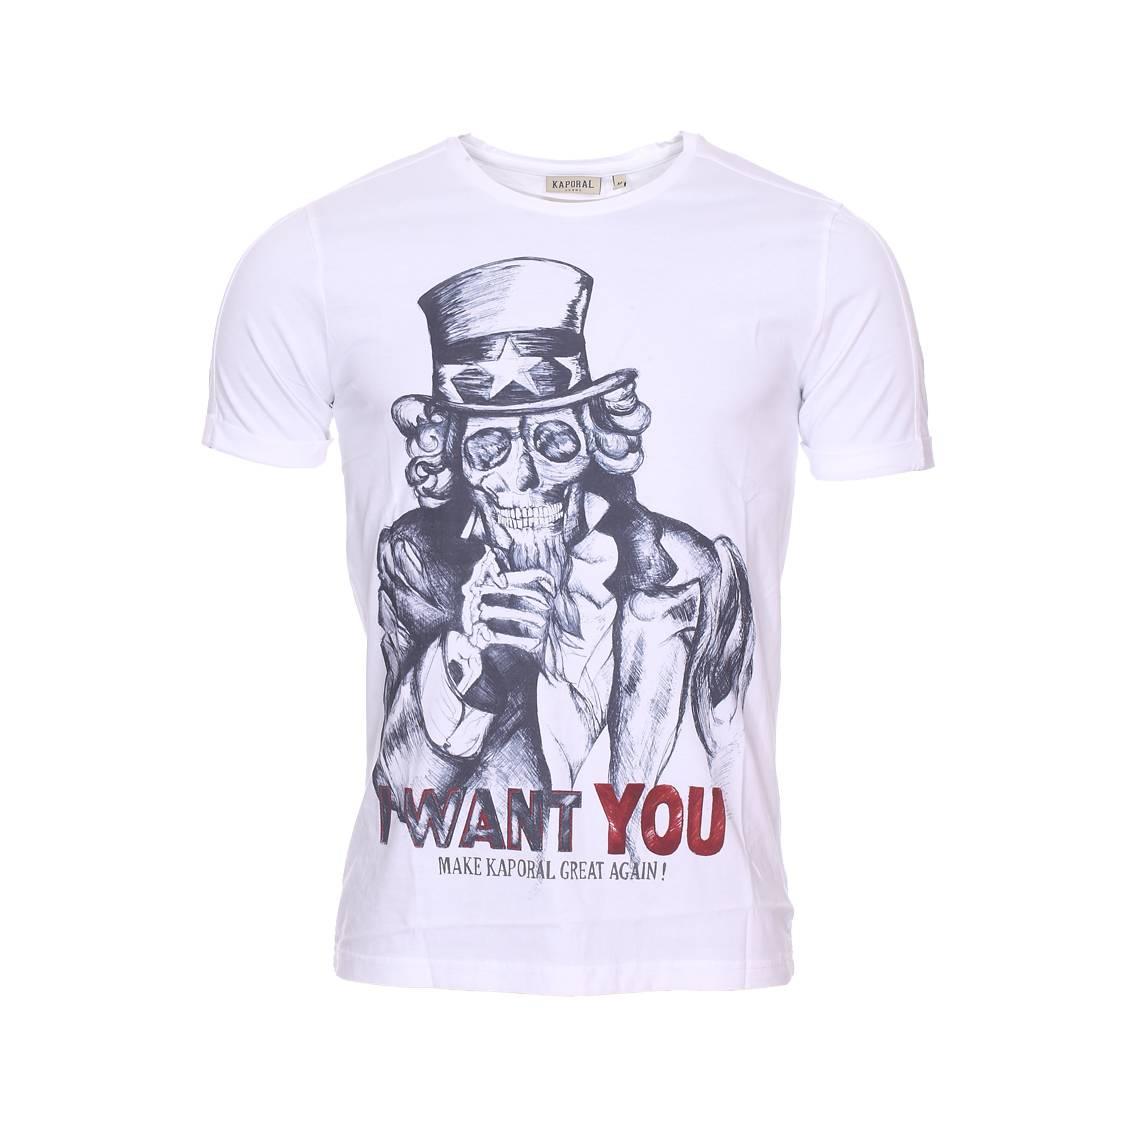 a15f5aba409bc Tee-shirt col rond Kaporal Samy en coton blanc imprimé ...